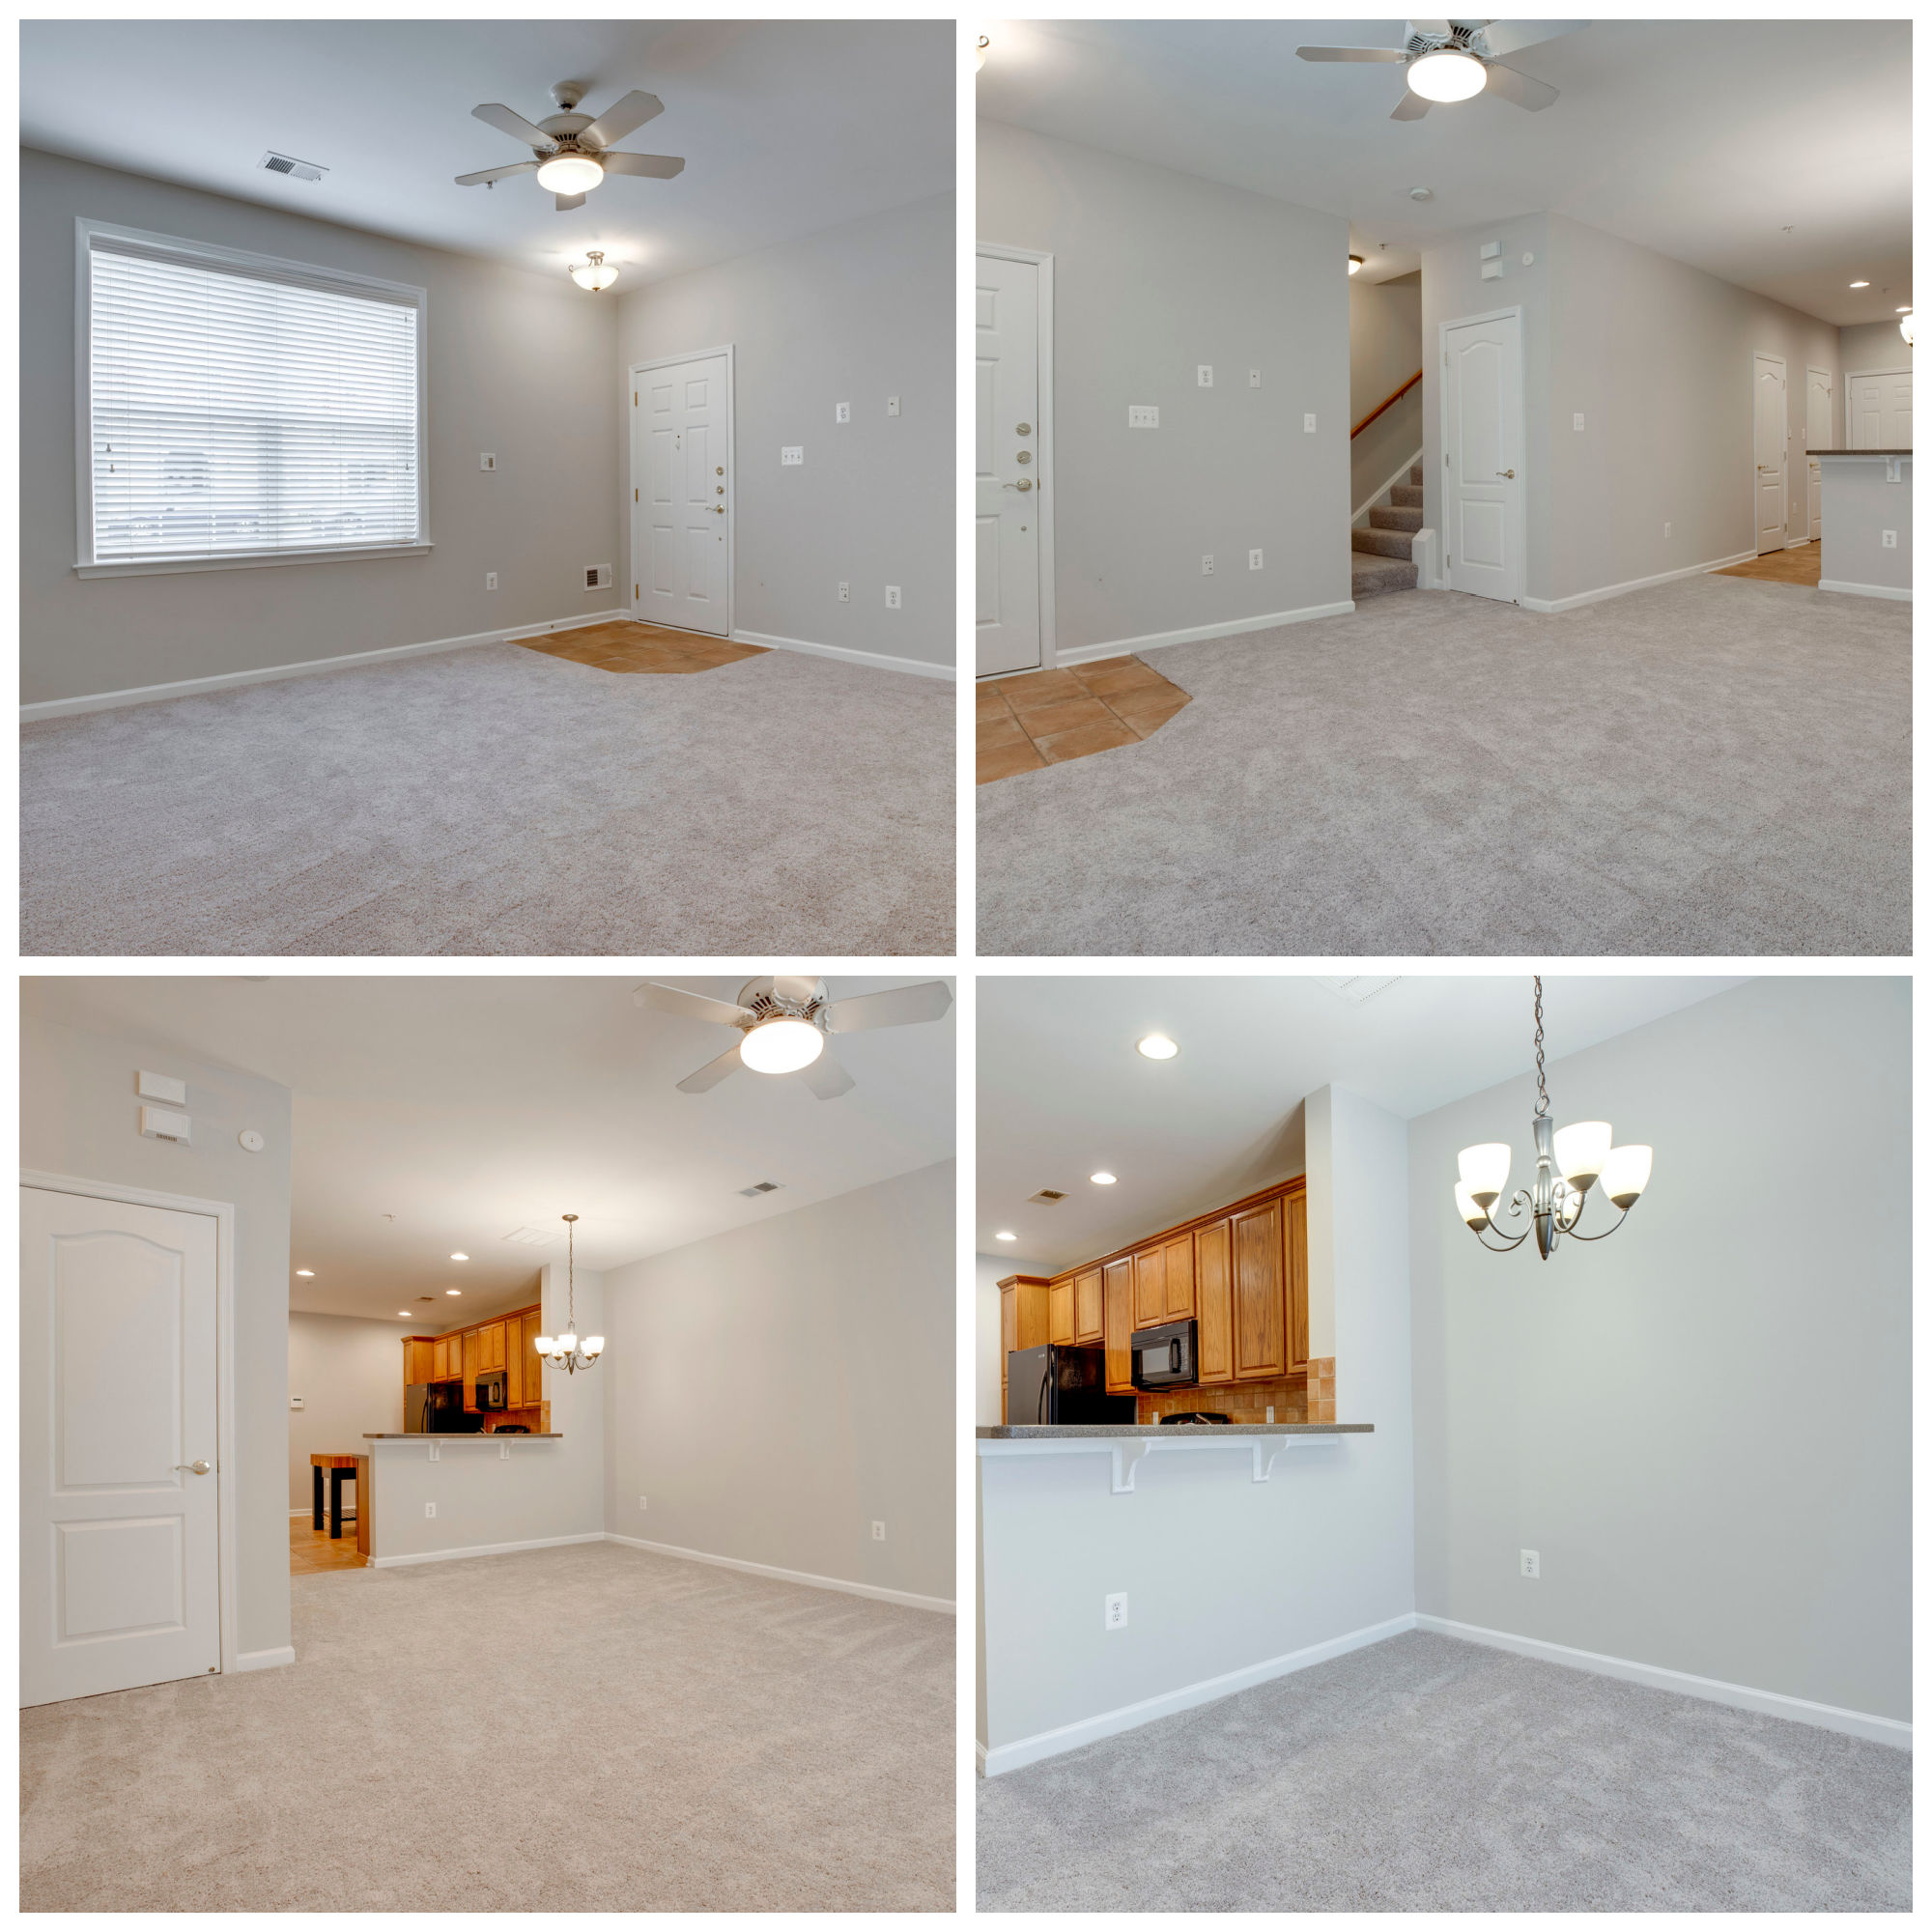 42637 Highgate Ter, Brambleton- Living and Dining Room